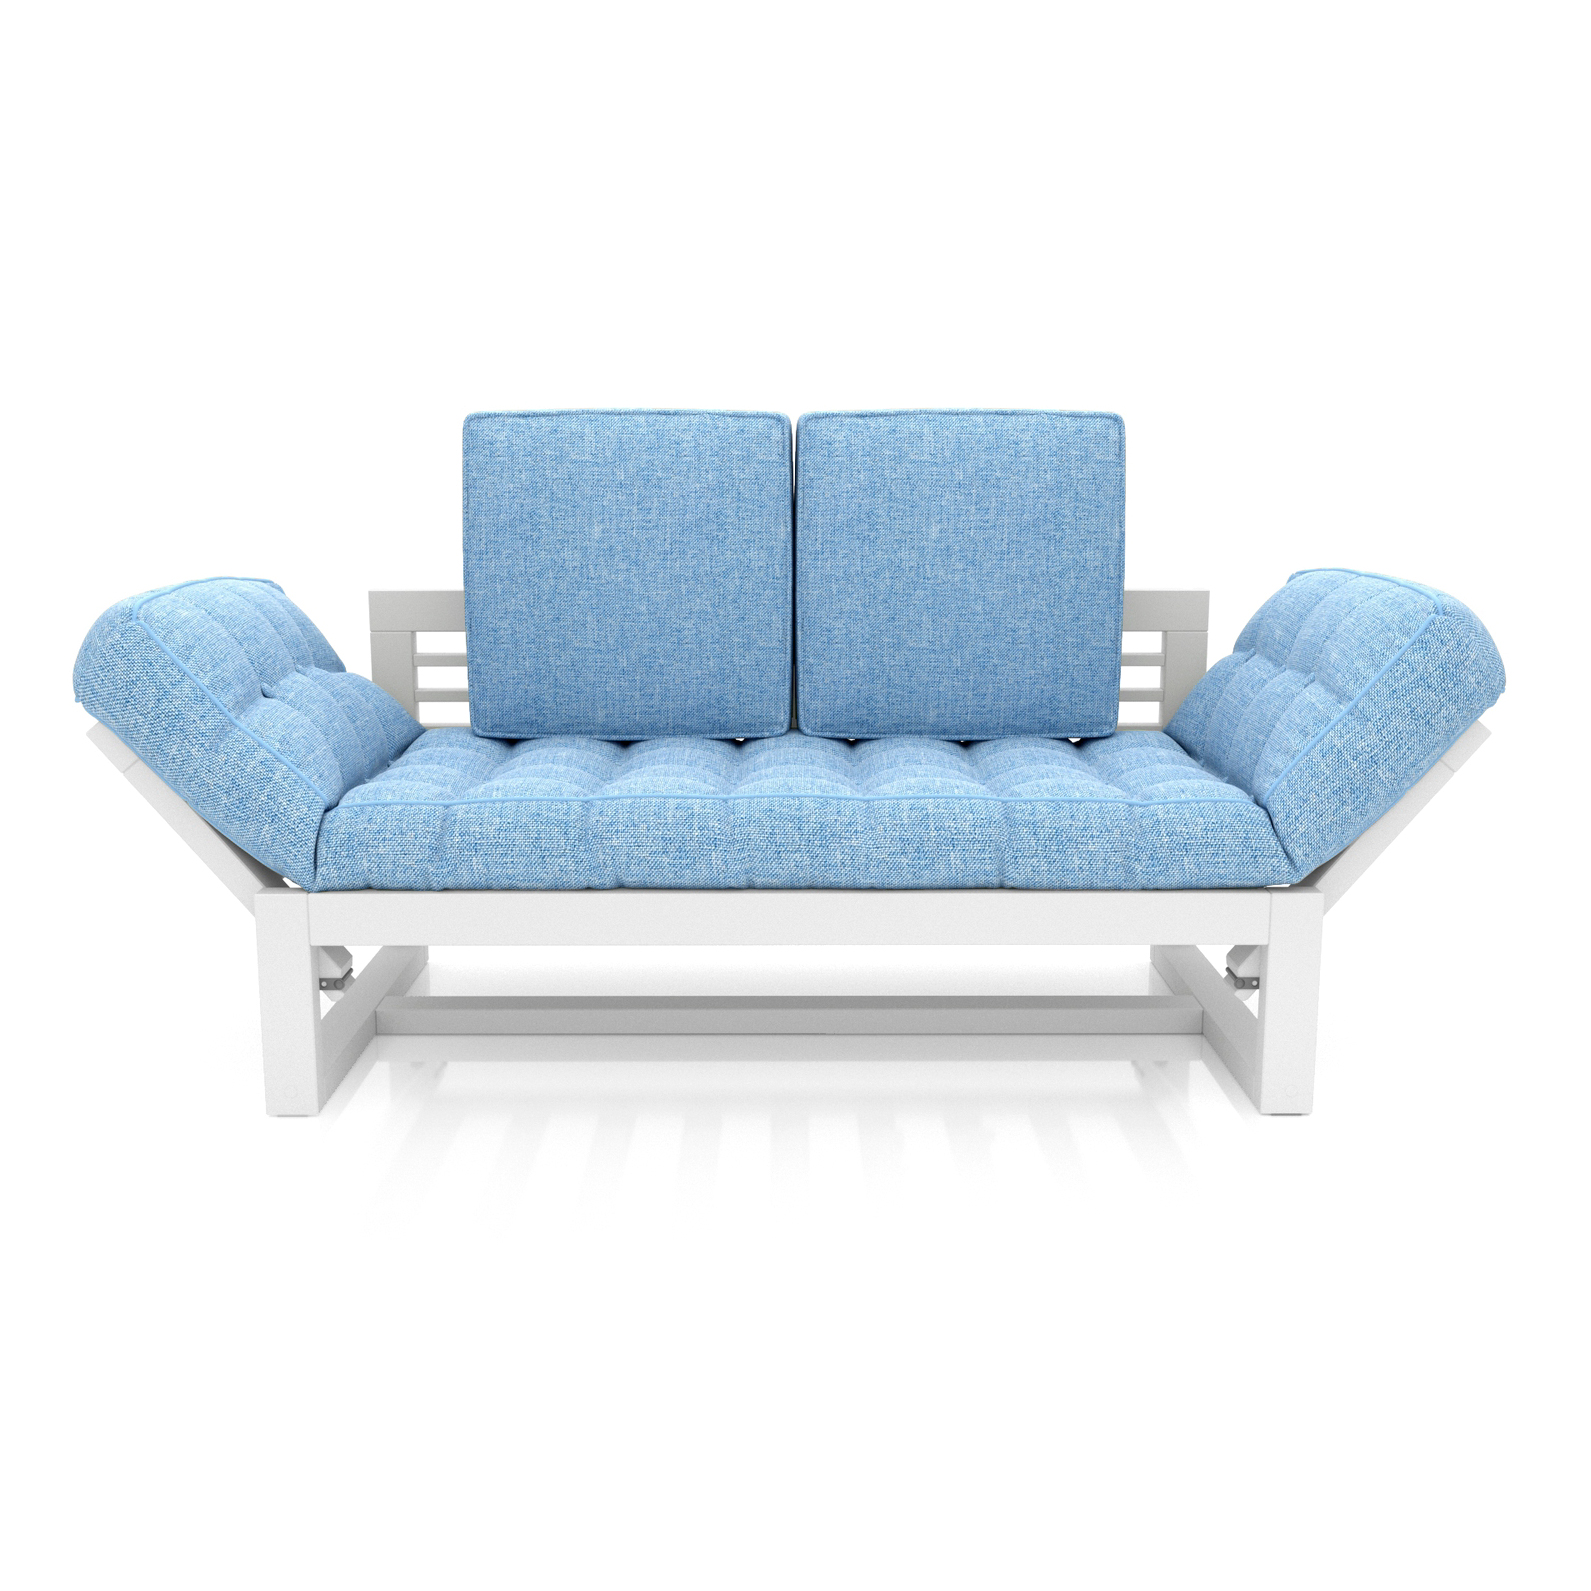 Кушетка AS Бекка 170x76x65 белый/голубой фото